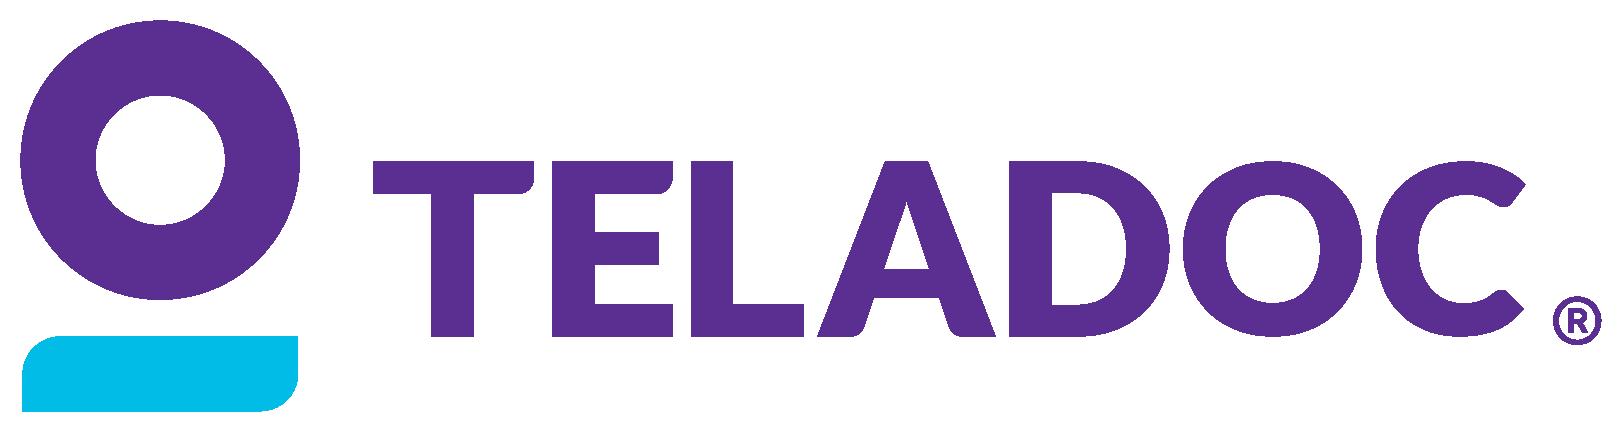 Teladoc Health, Inc. Program Terms